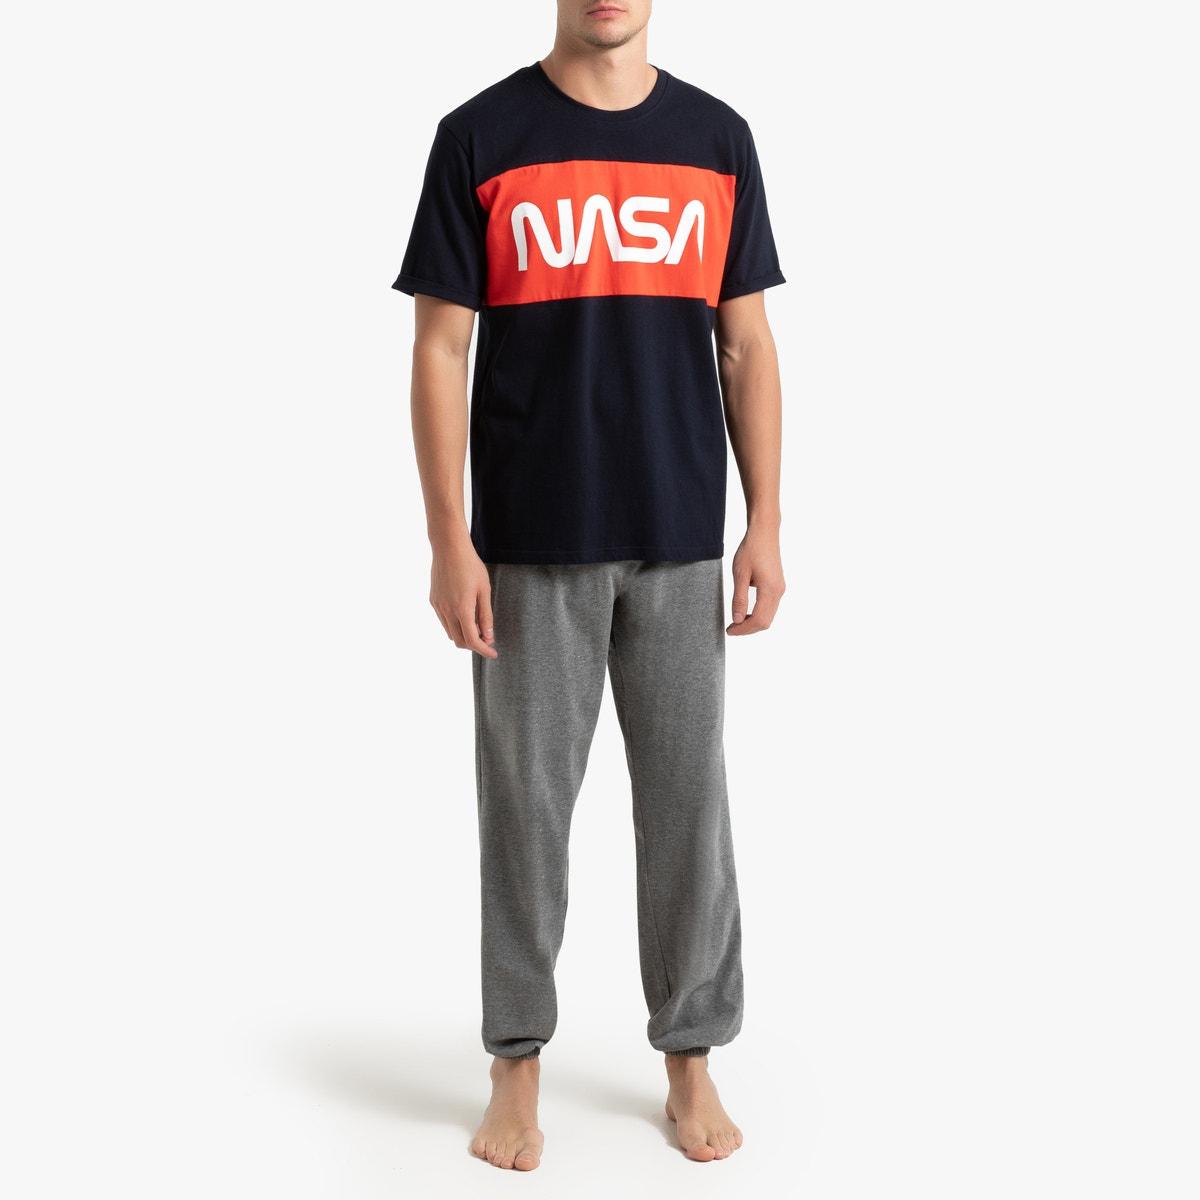 Nasa - Πιτζάμα με κοντομάνικη μπλούζα και μακρύ παντελόνι 350159023 - 10505